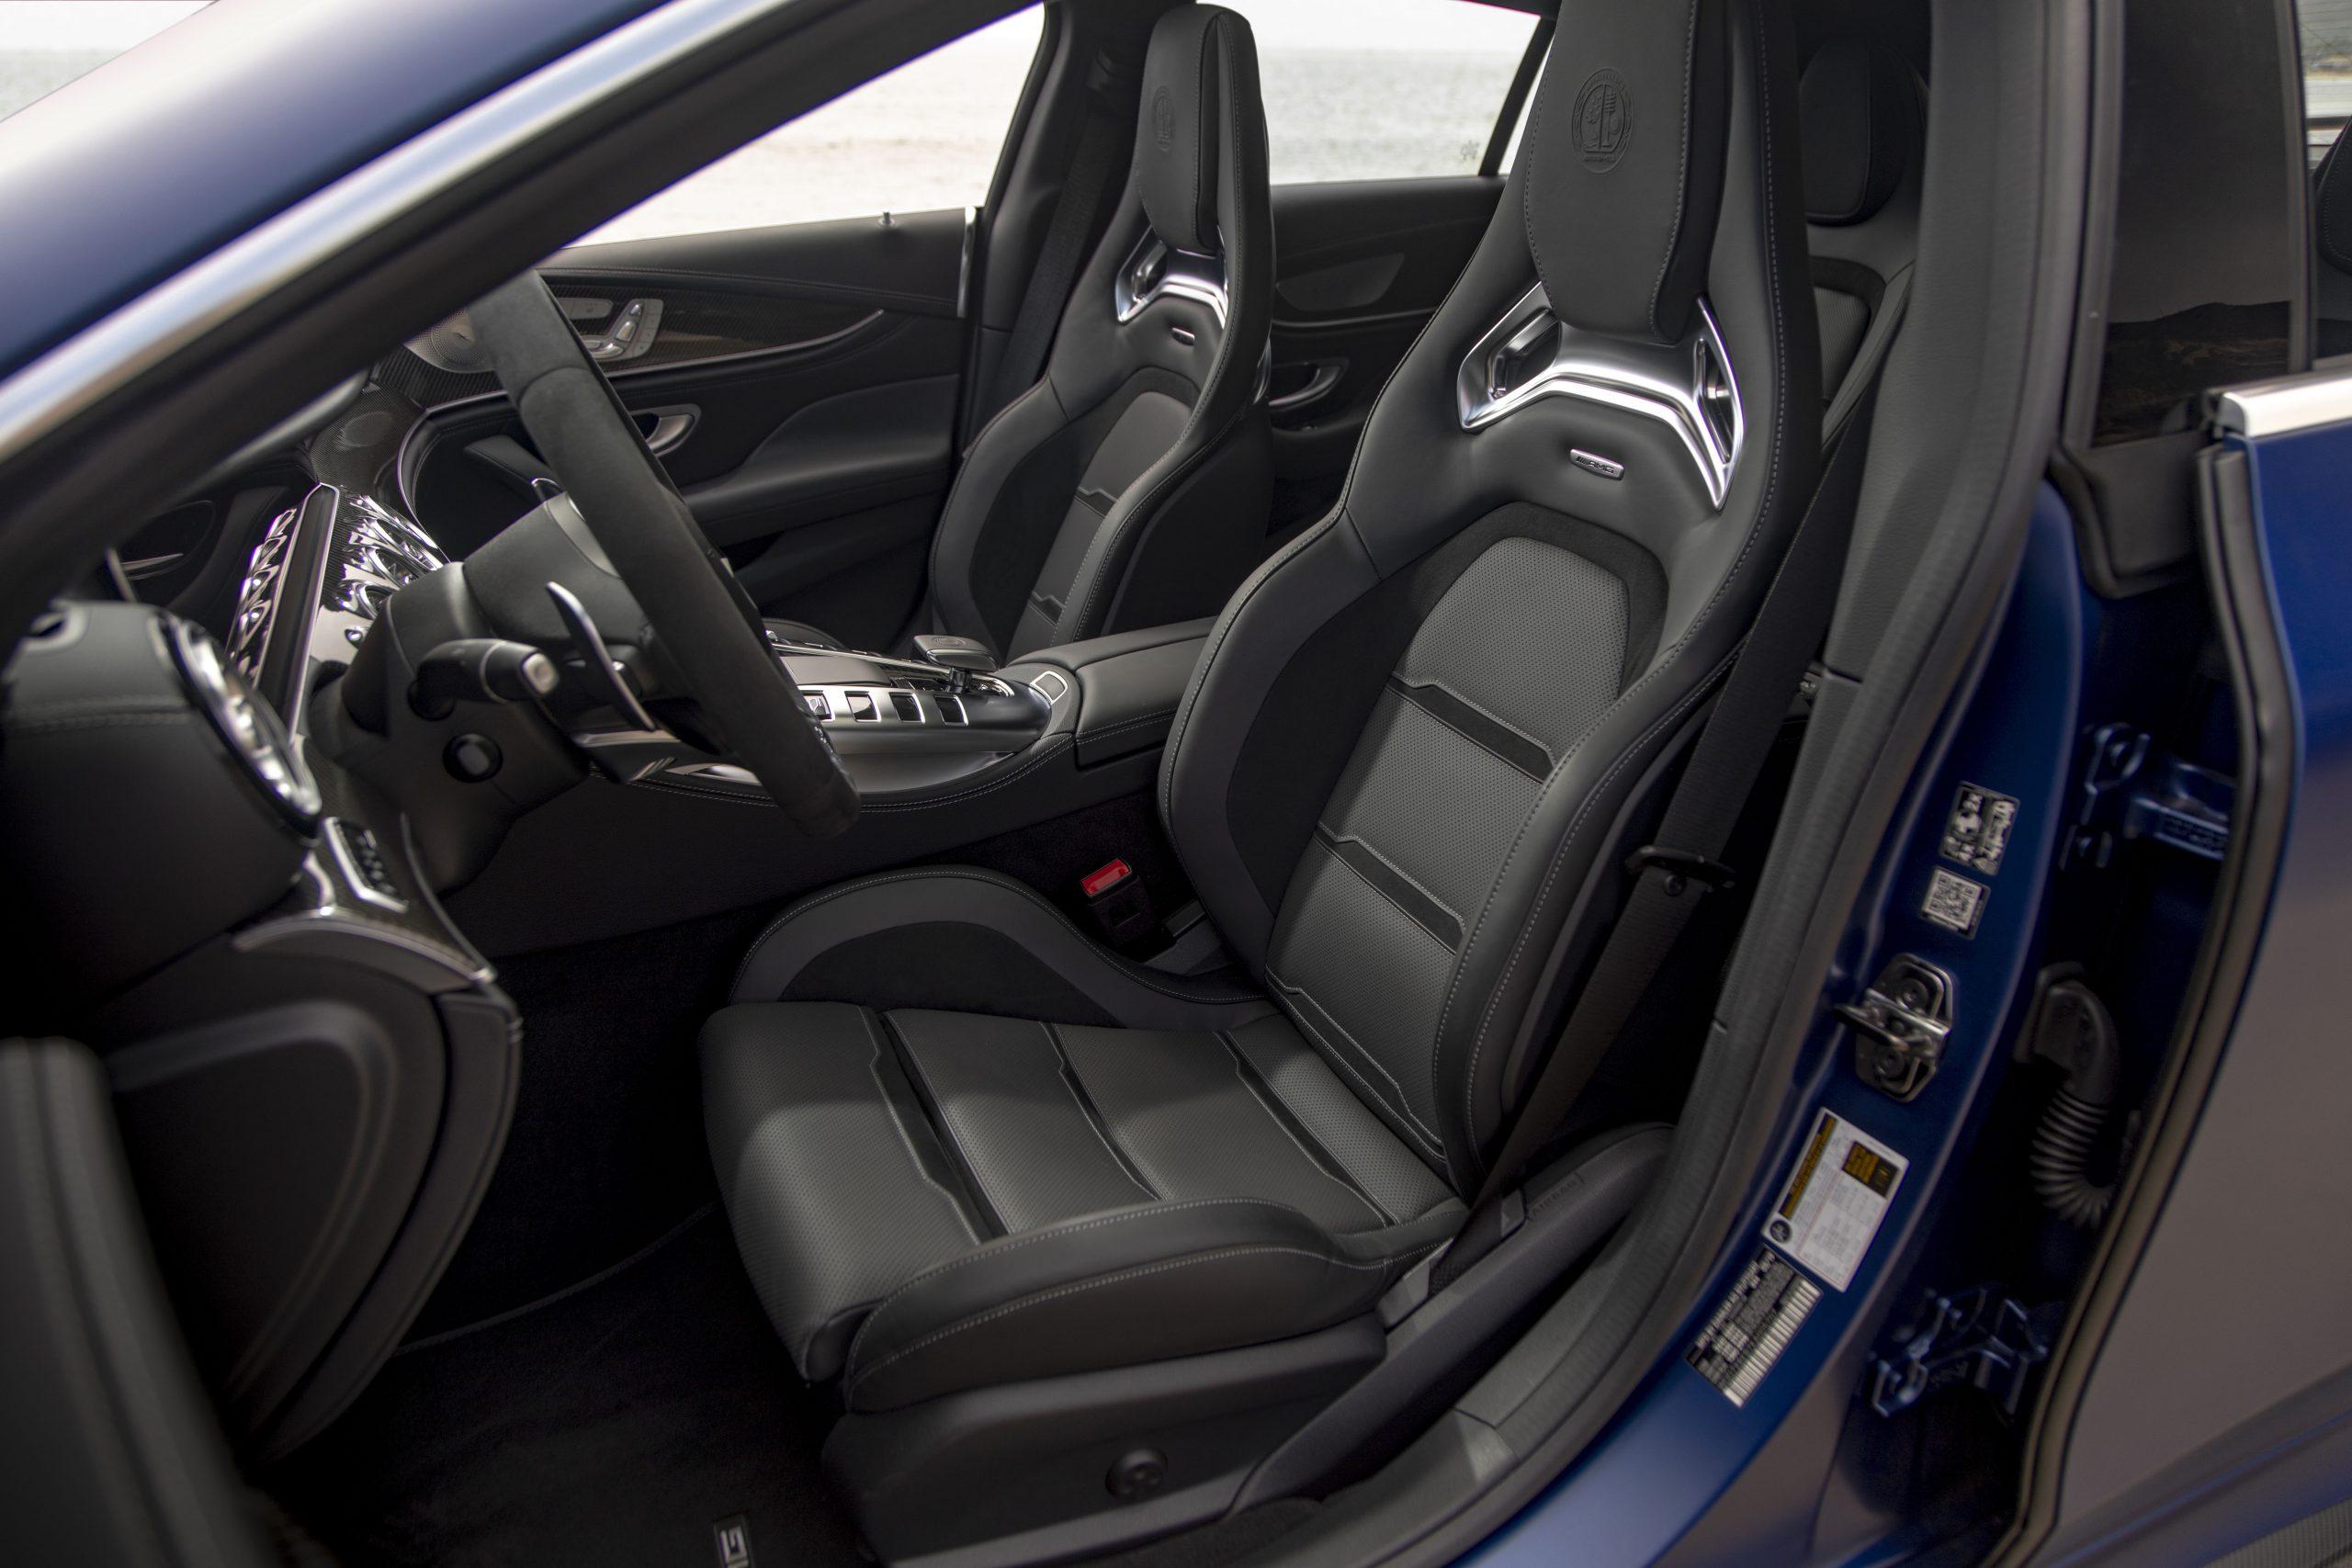 2021 Mercedes-AMG GT 63 S Seats